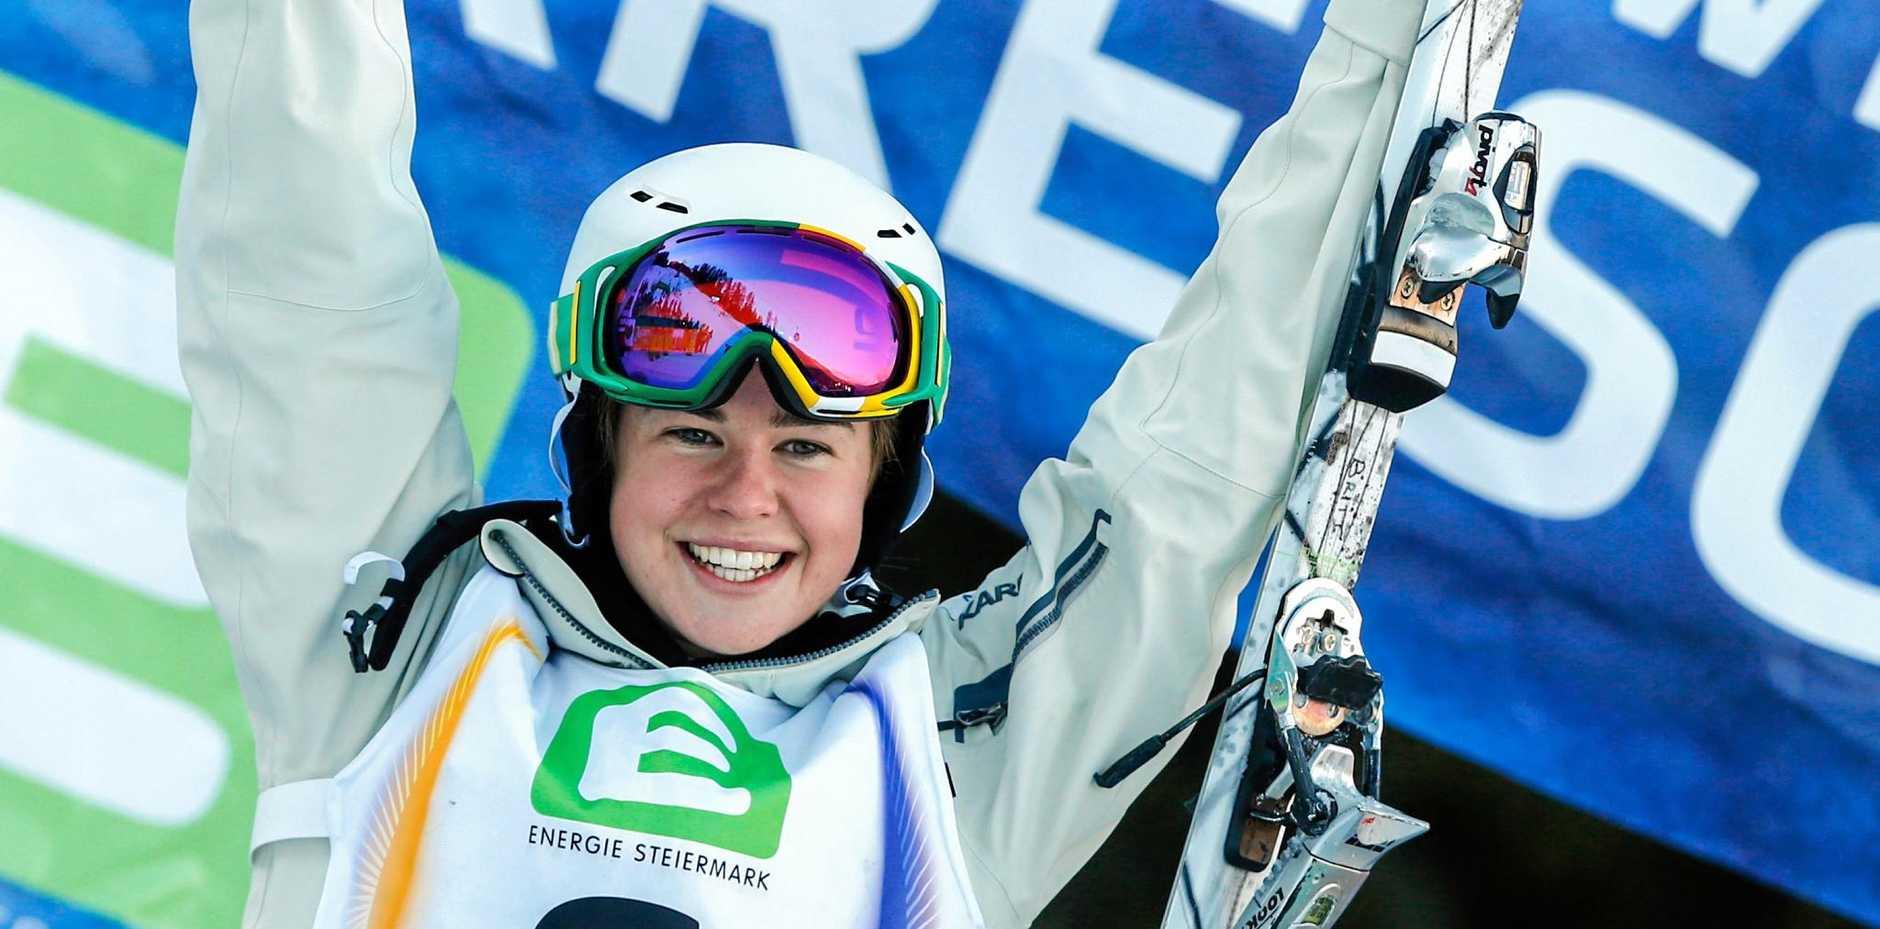 Britt Cox of Australia won a World Cup moguls event in Finland.